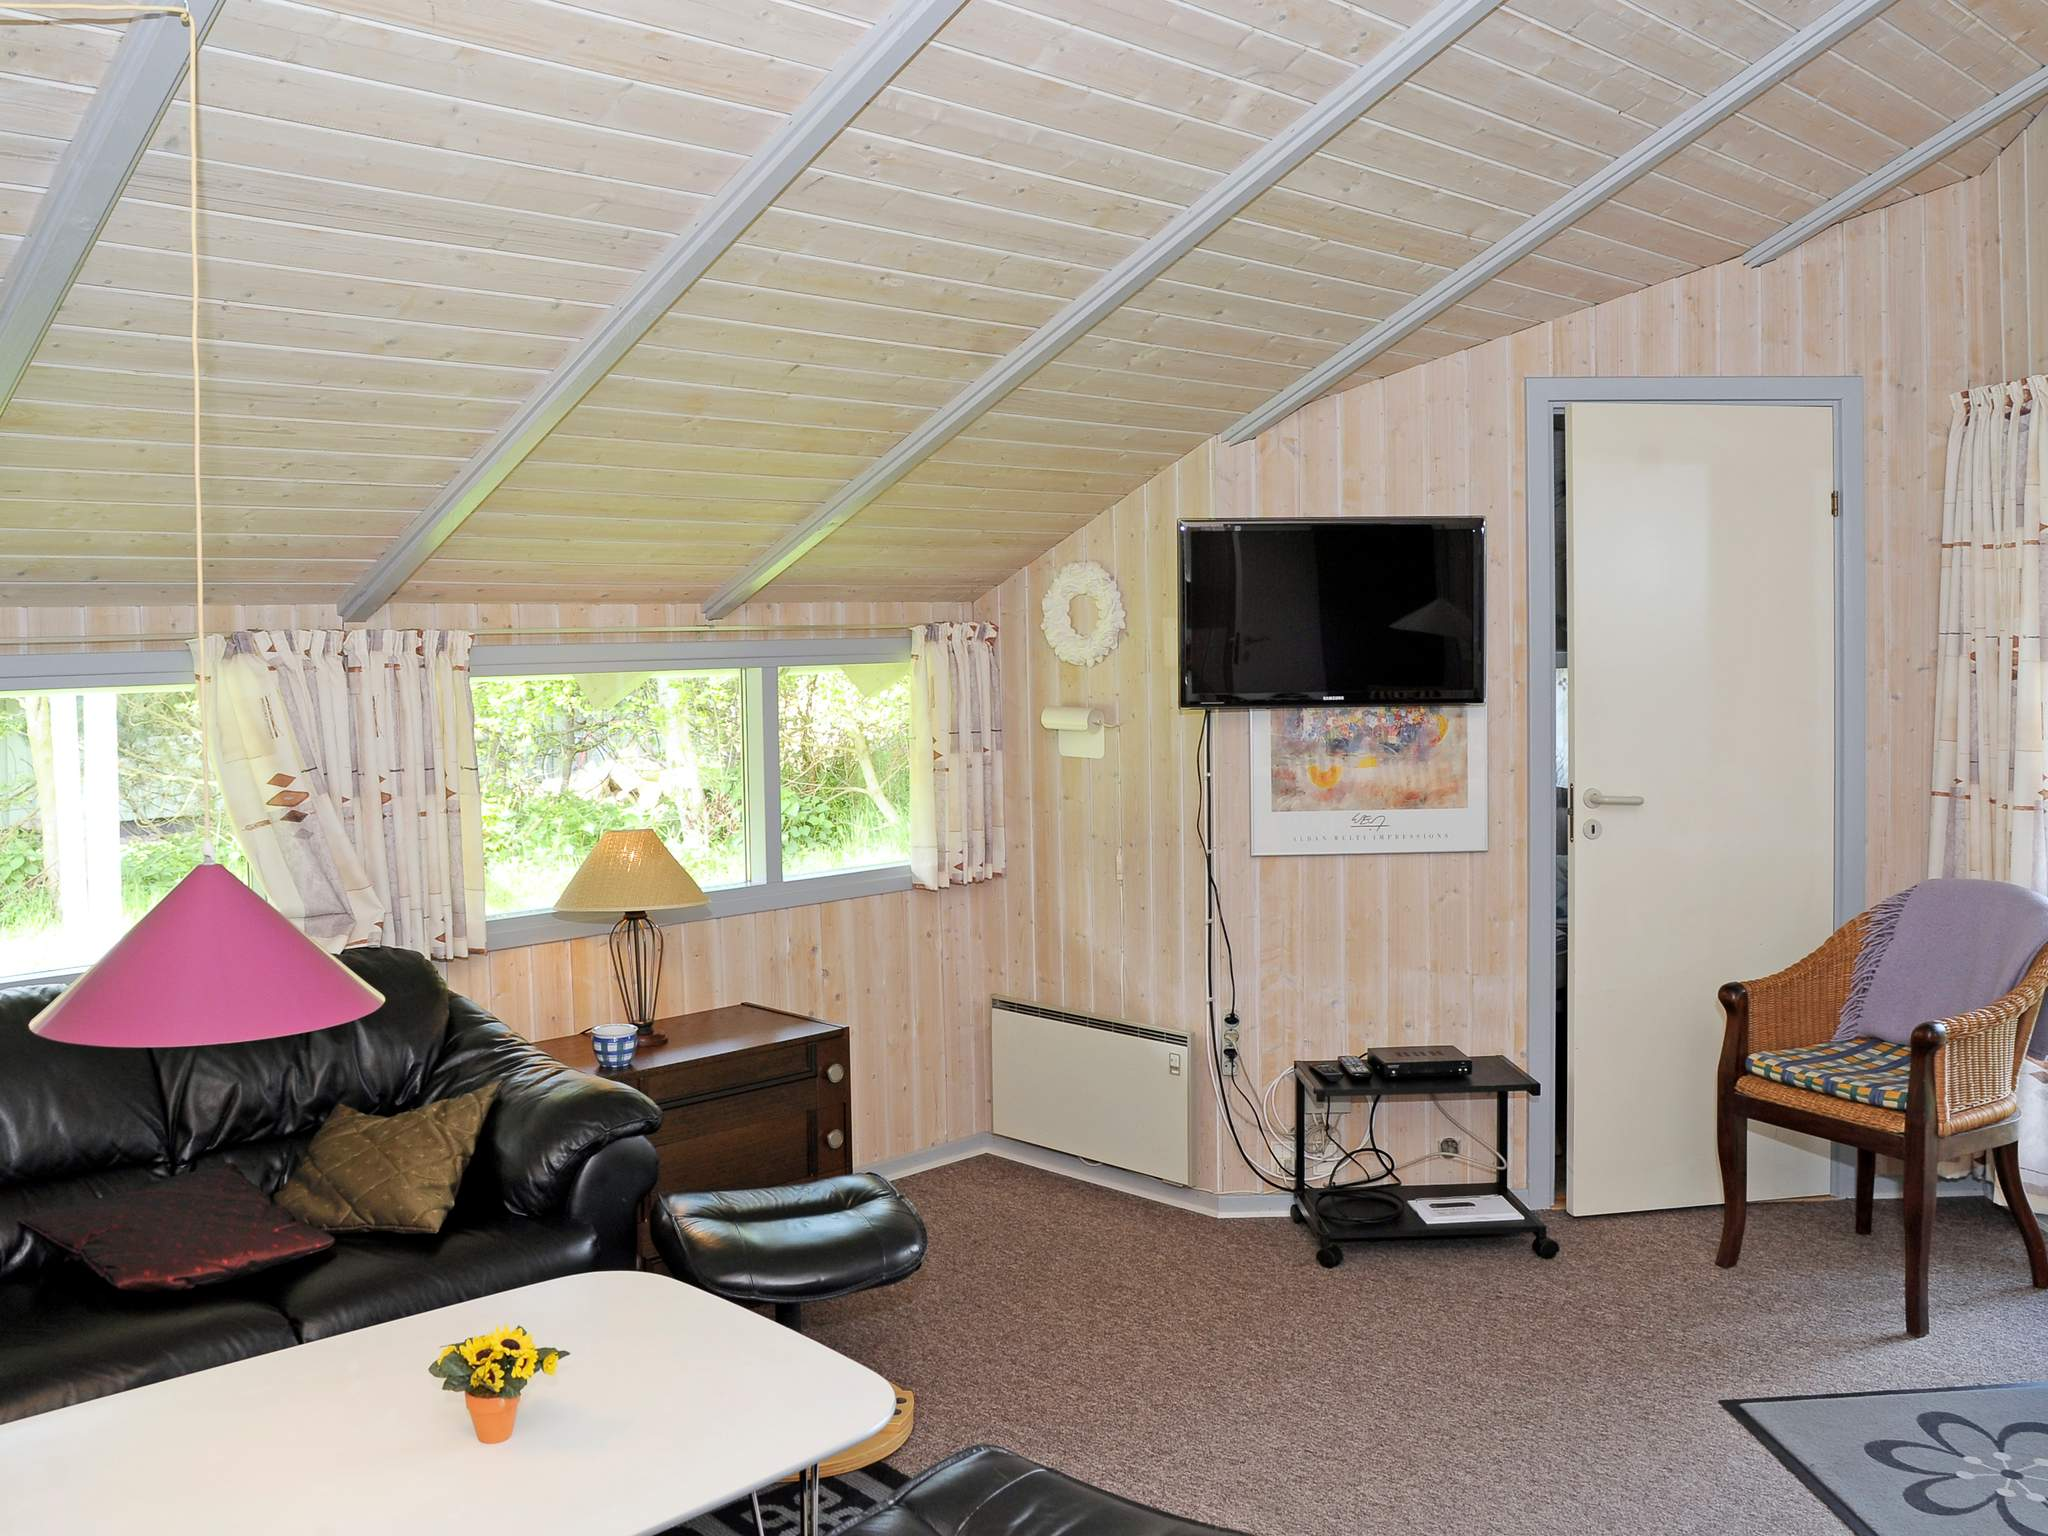 Ferienhaus Ristinge (93203), Ristinge, , Langeland, Dänemark, Bild 7